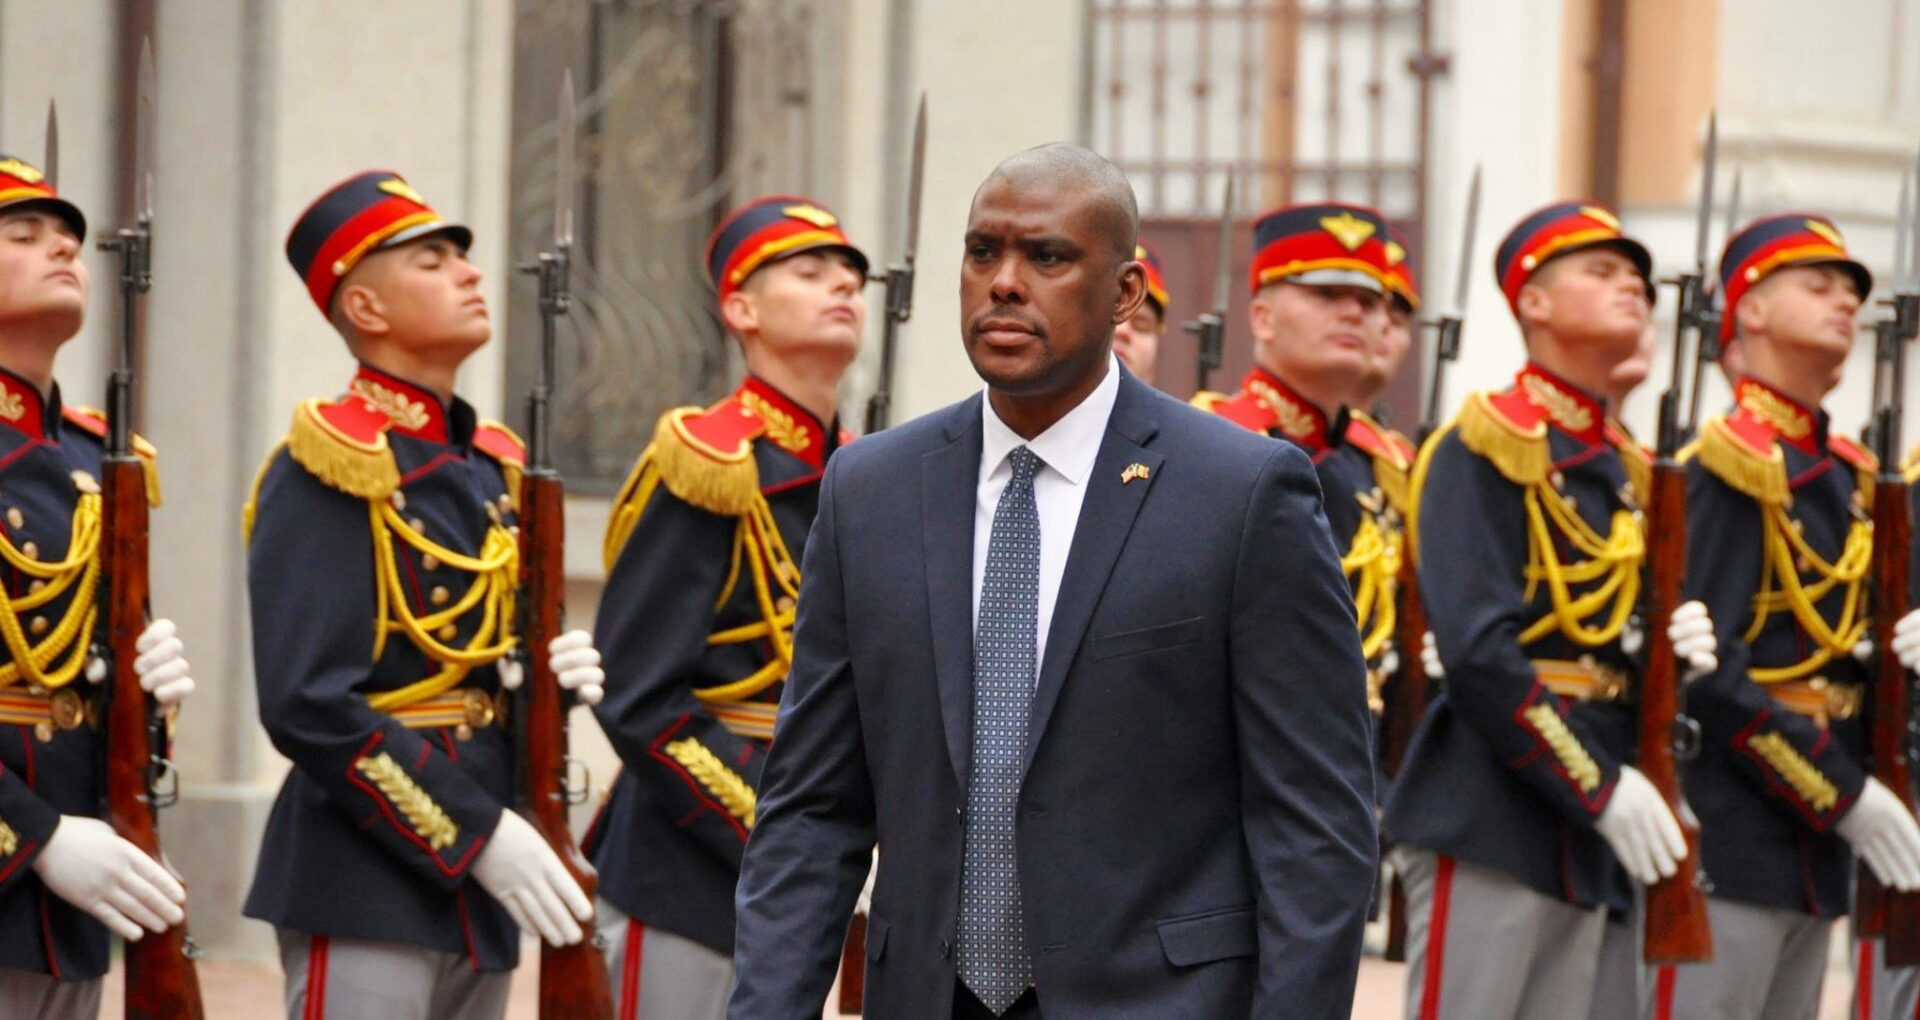 Mesaj exclusiv de la ambasadorul Hogan către Parlament: SUA rămân prieten fidel al poporului Moldovei